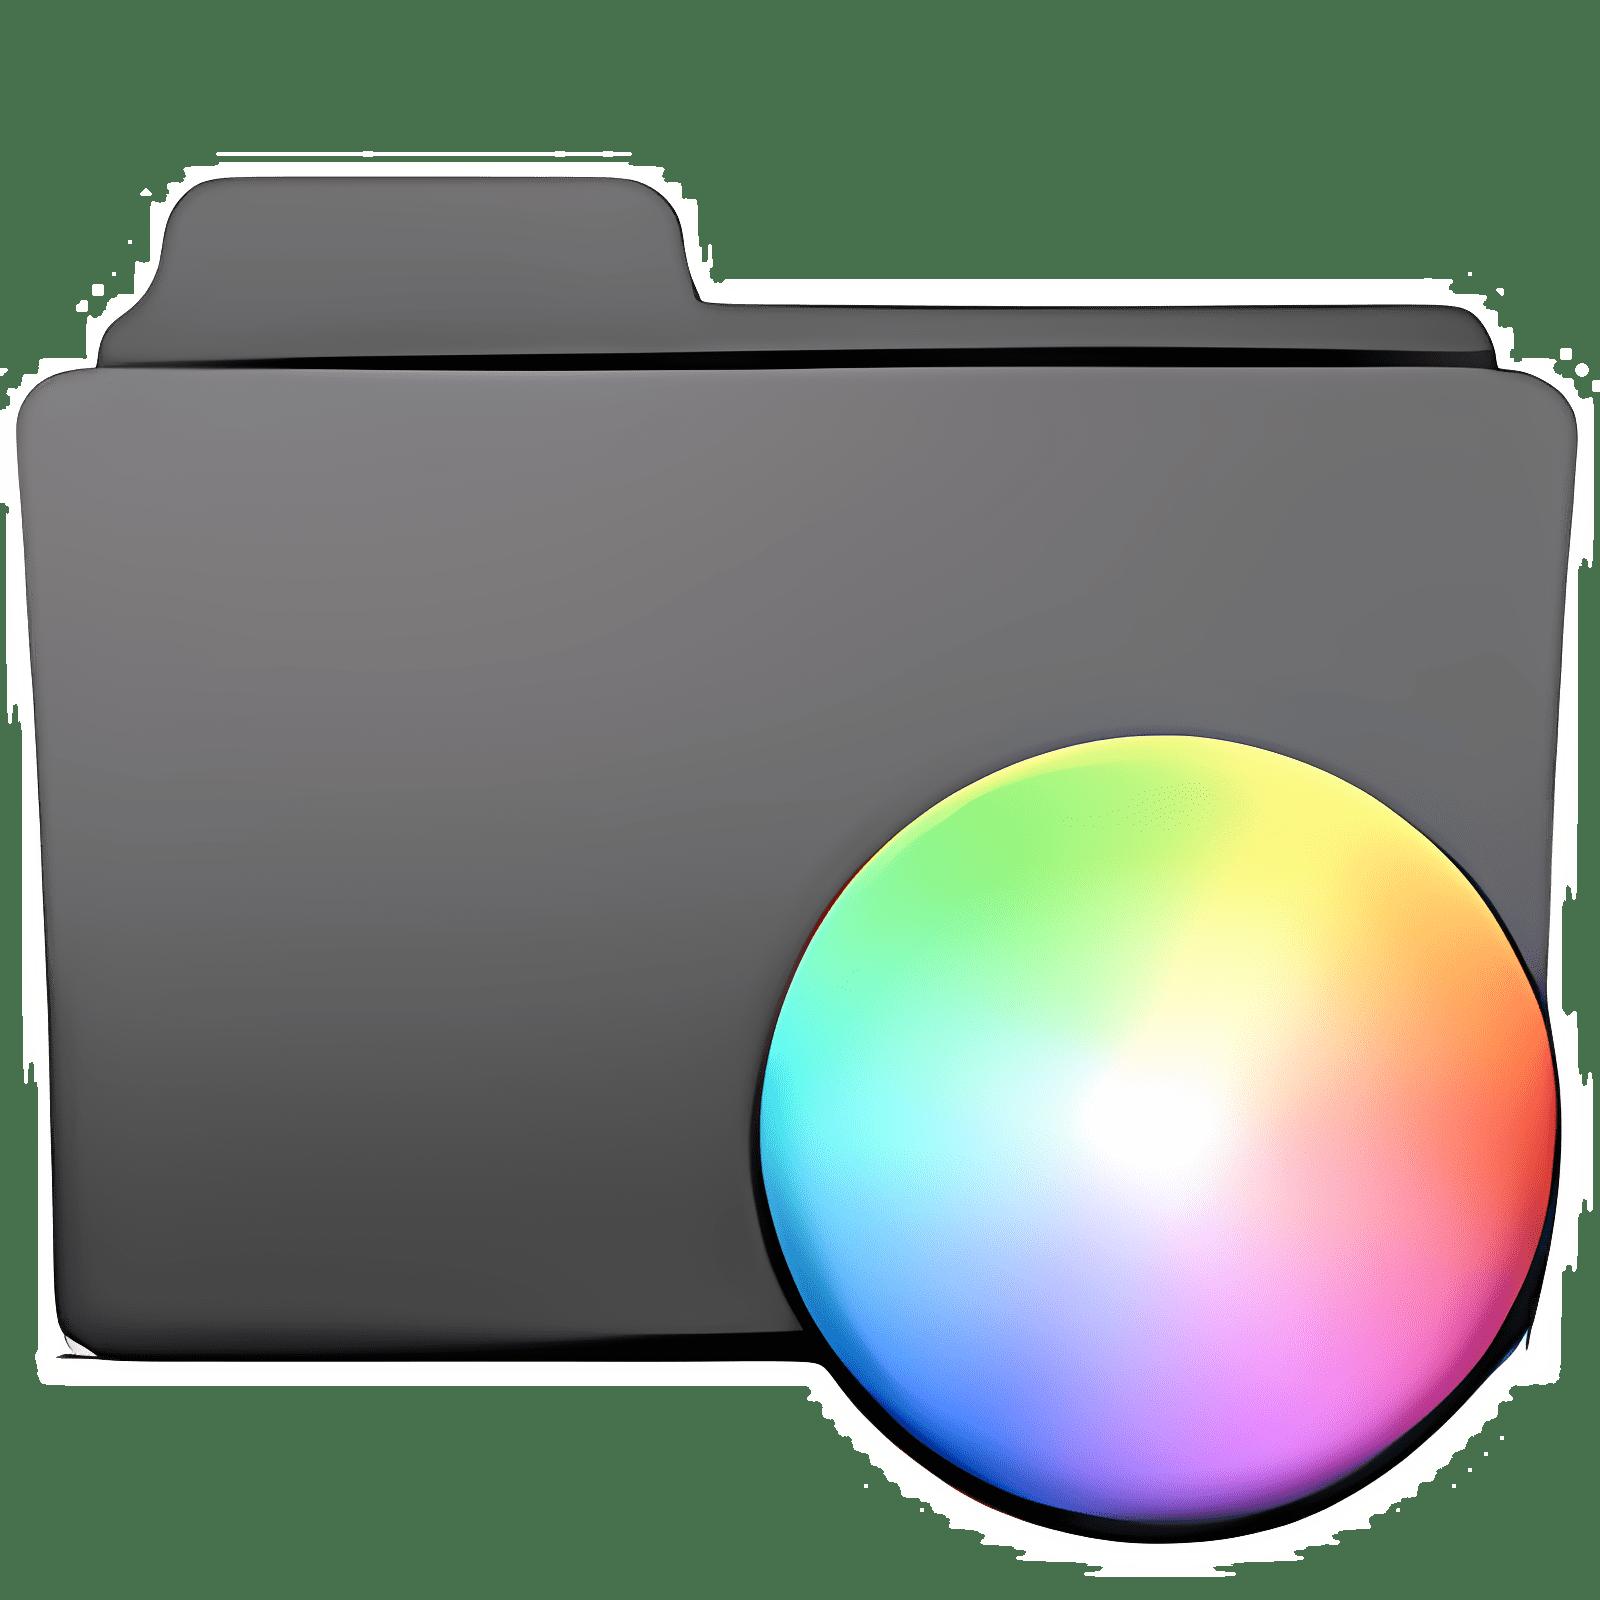 FolderTeint 1.0.1